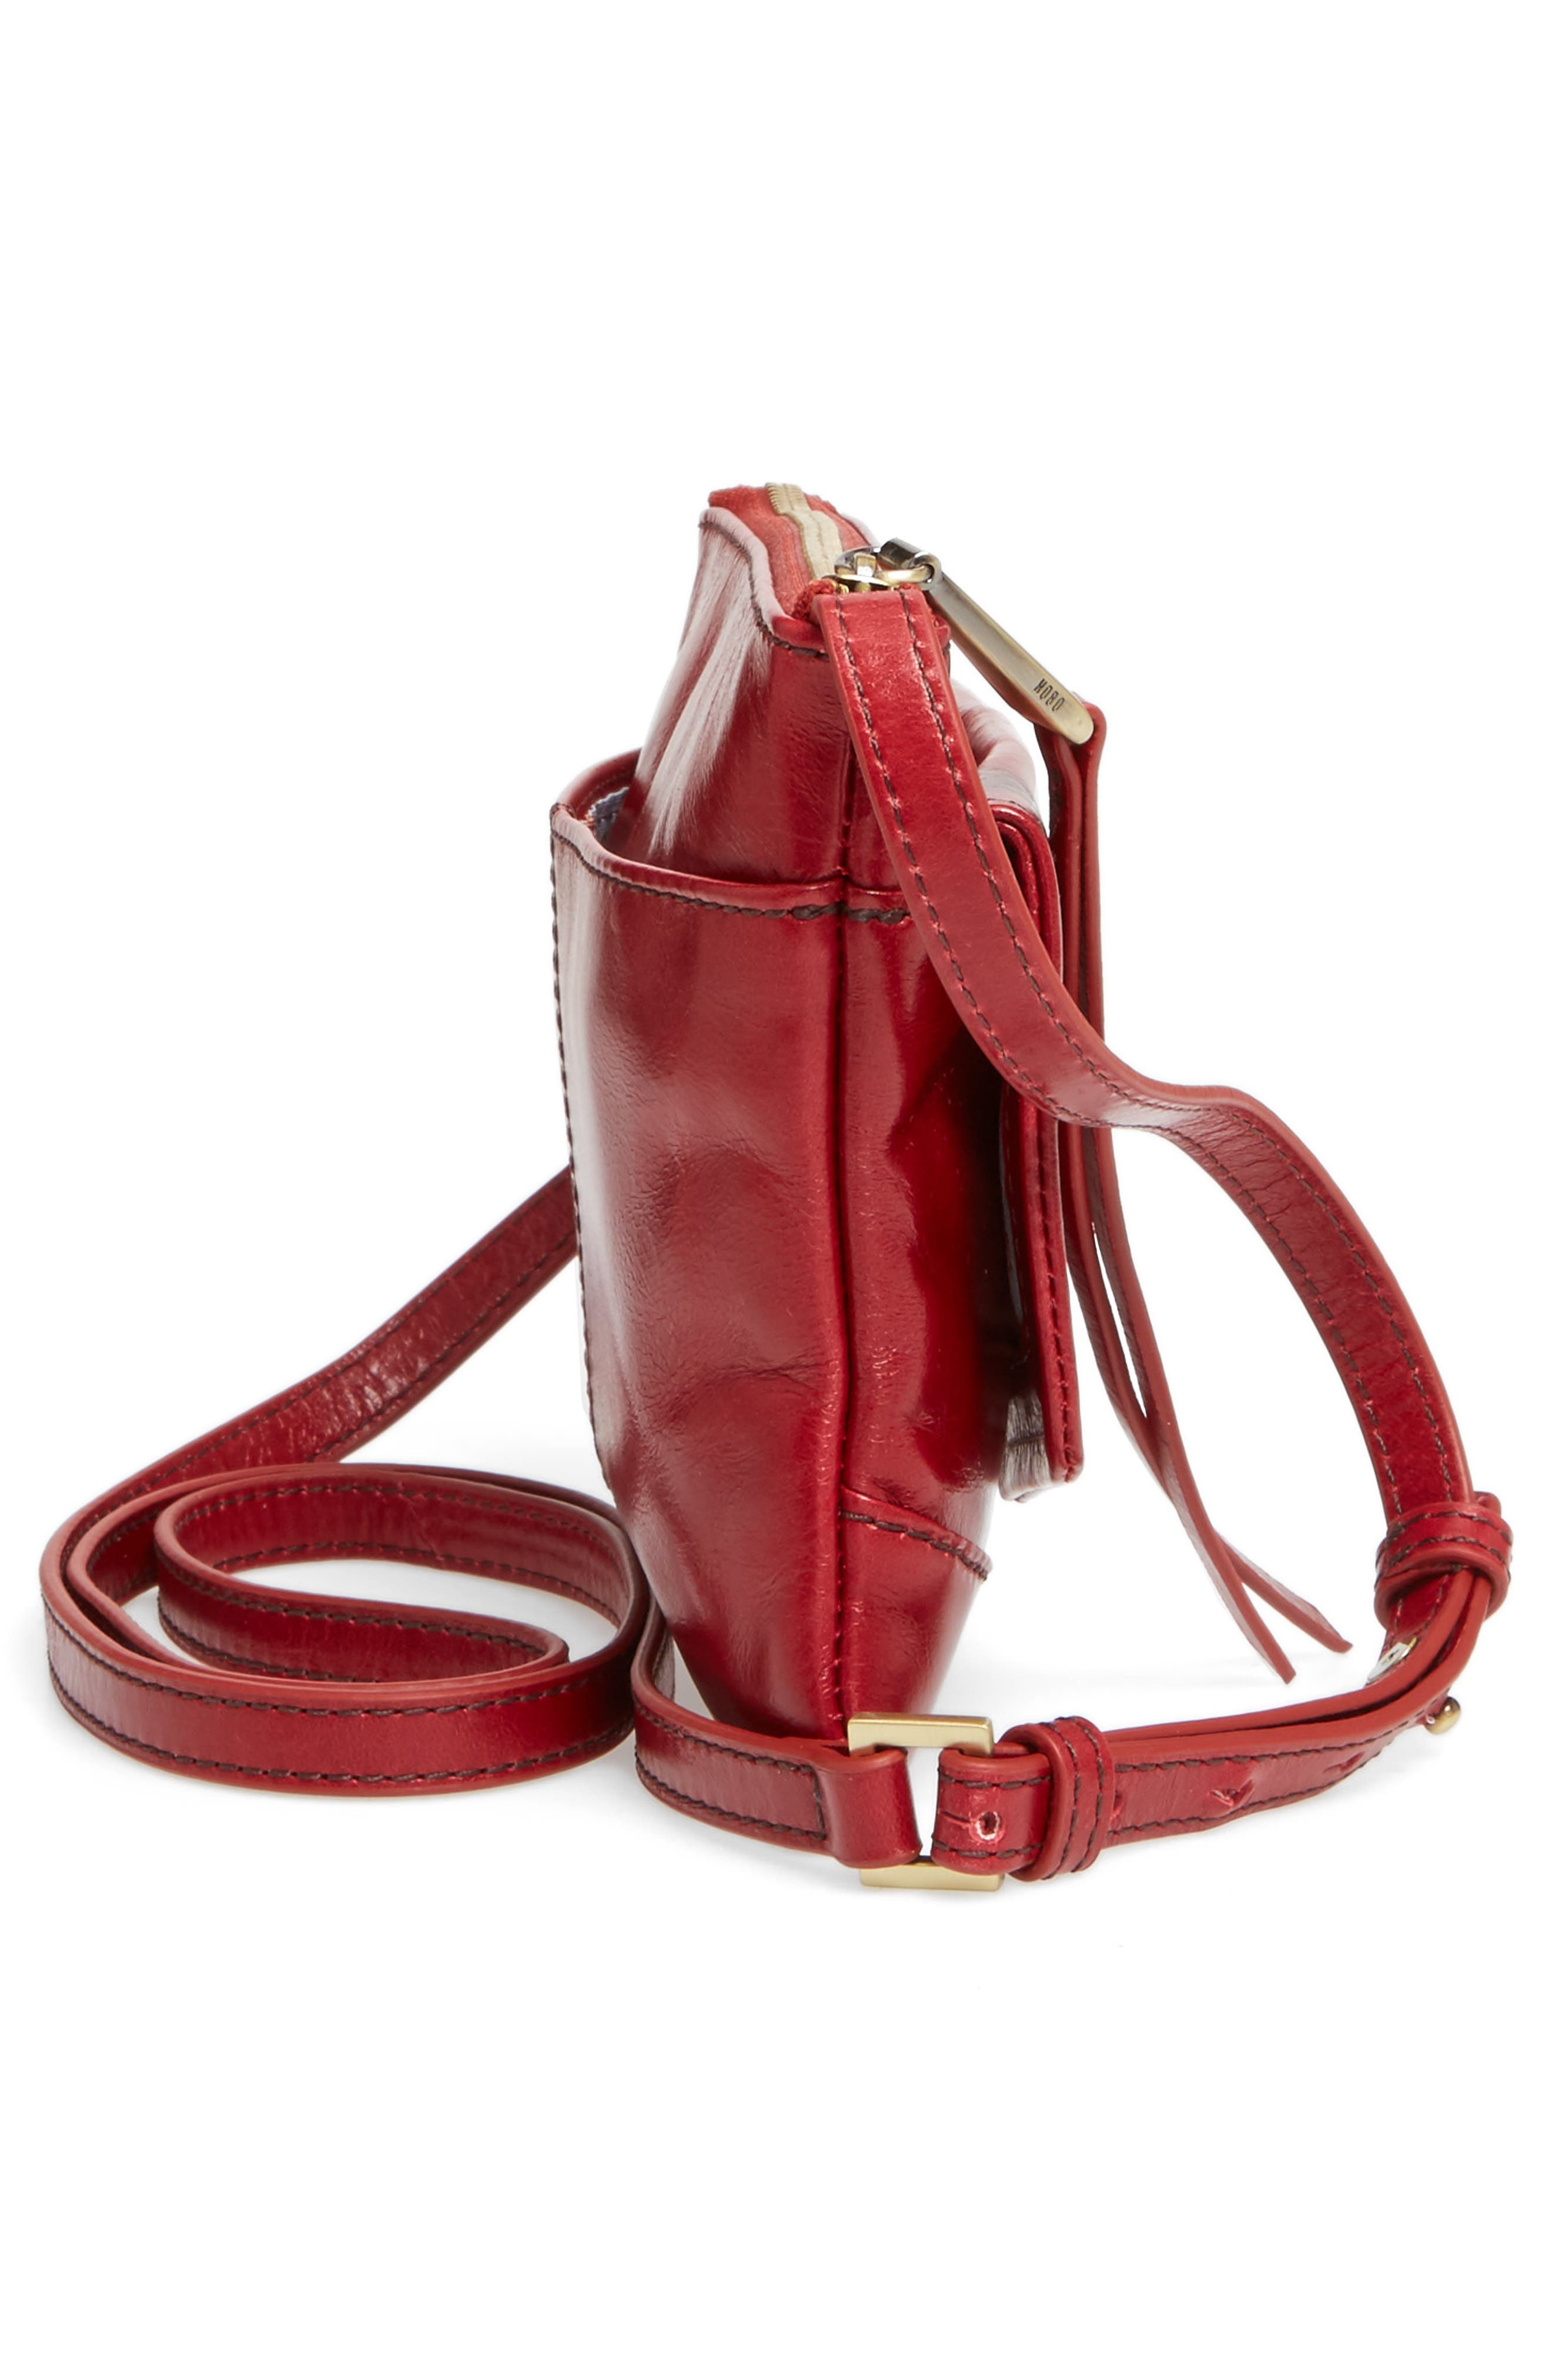 Amble Leather Crossbody Bag,                             Alternate thumbnail 54, color,